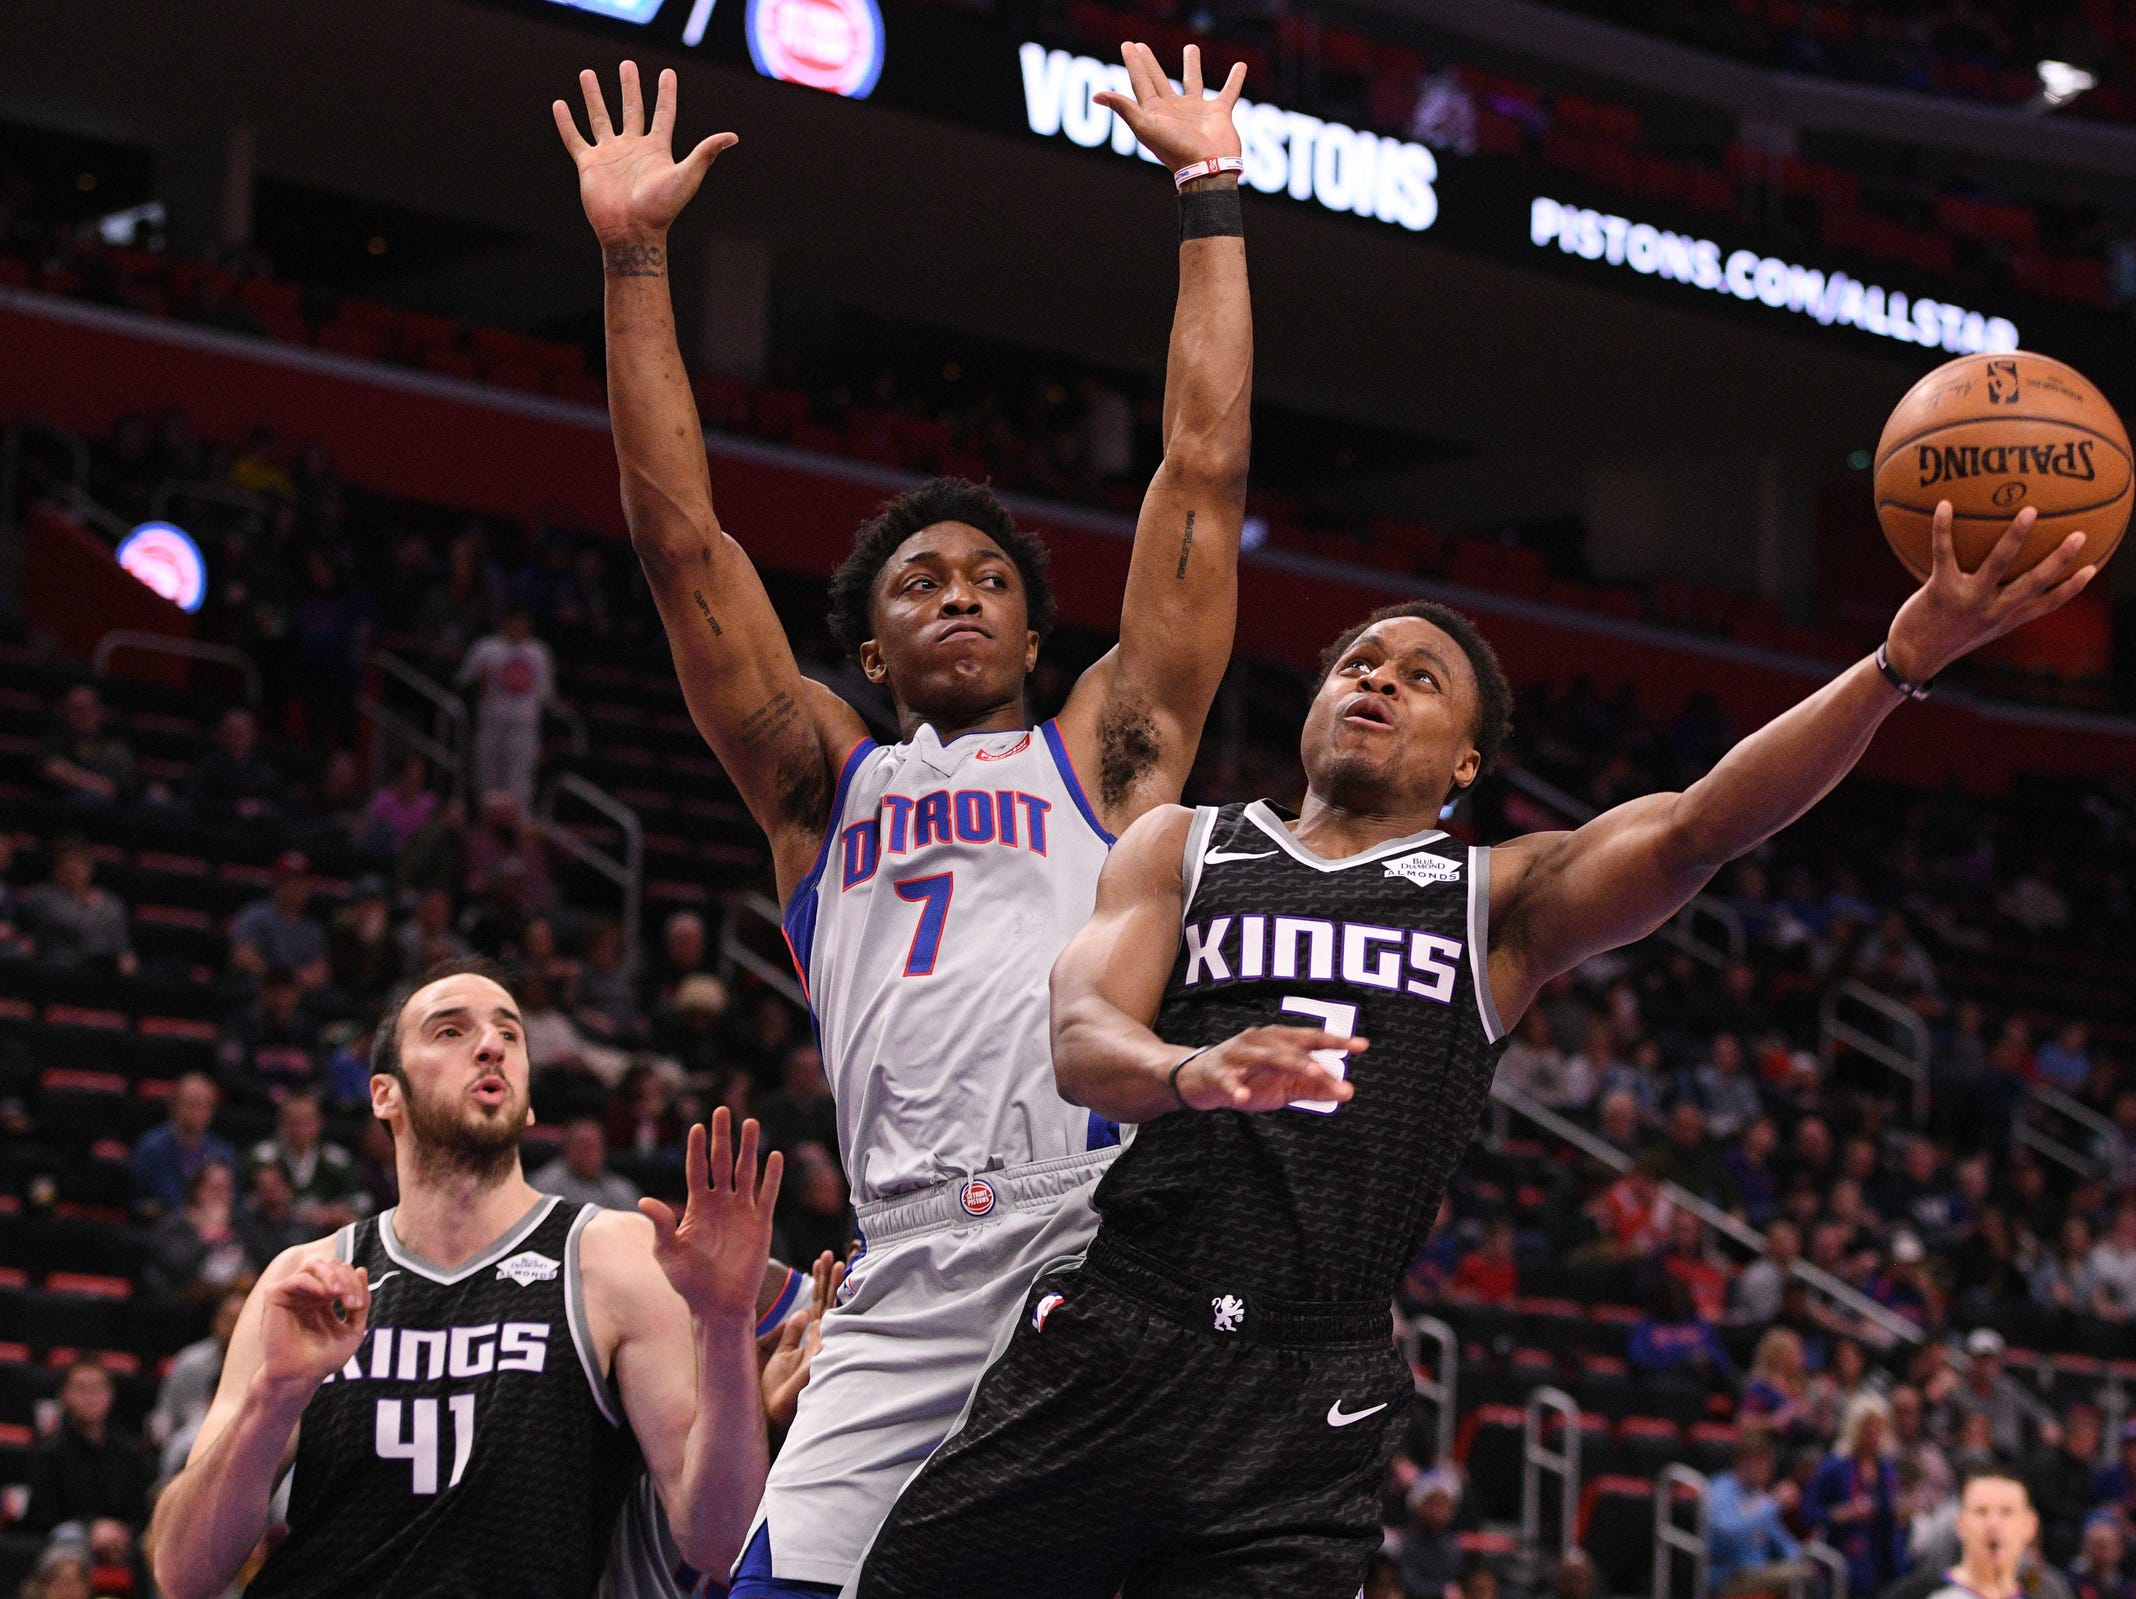 Sacramento Kings guard Yogi Ferrell (3) photos a layup defended by Detroit Pistons forward Stanley Johnson (7) at Little Caesars Arena.